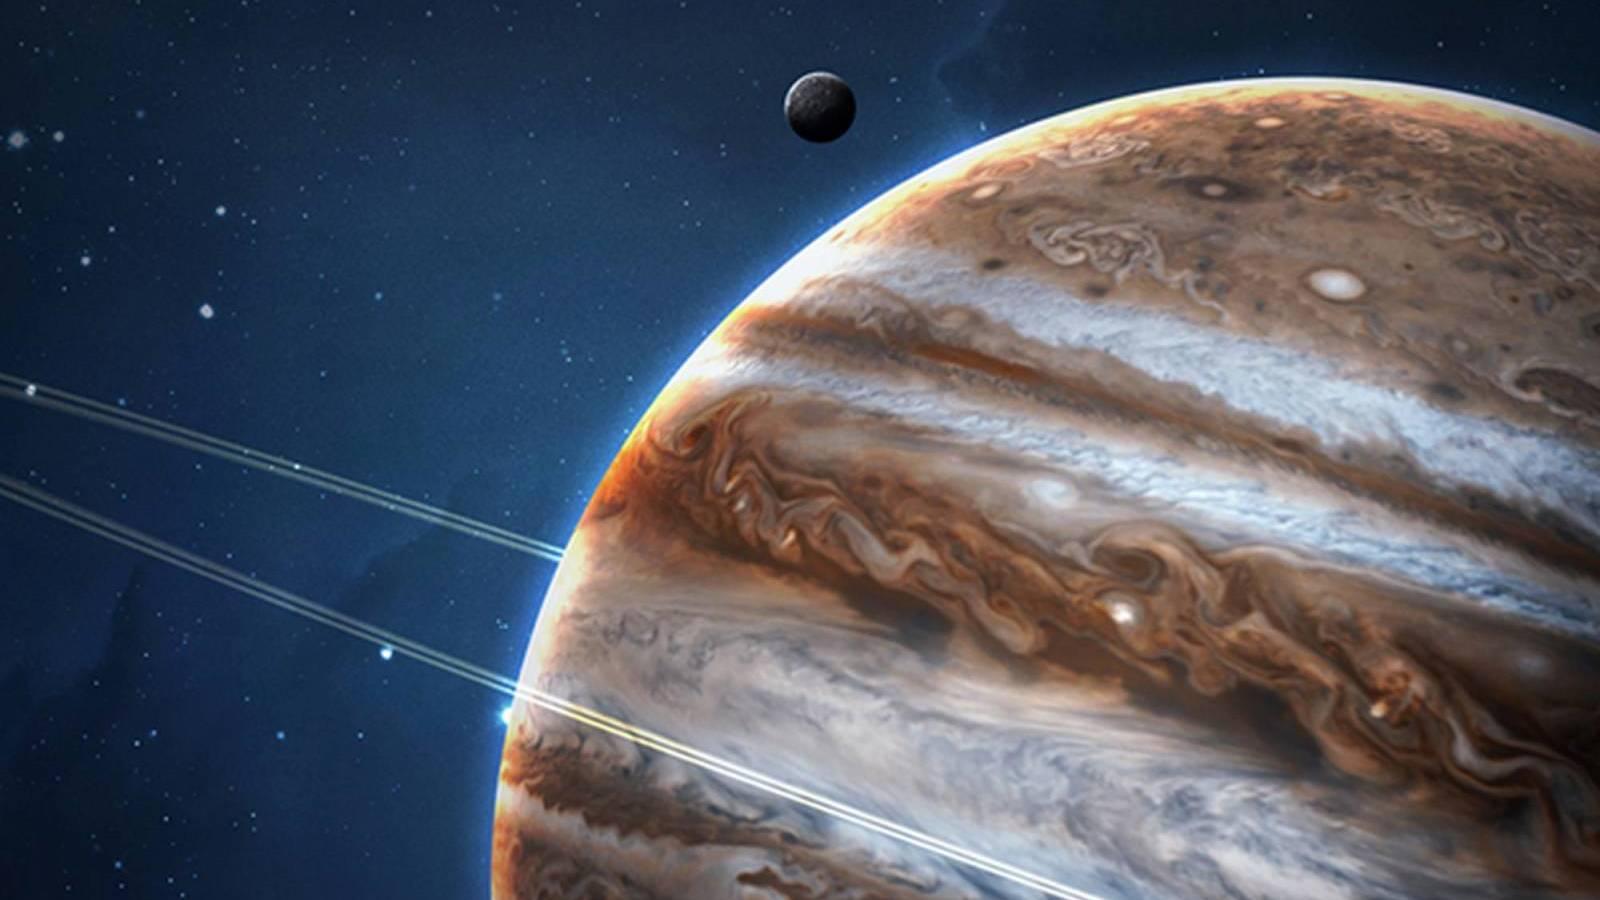 planeta Jupiter negativa